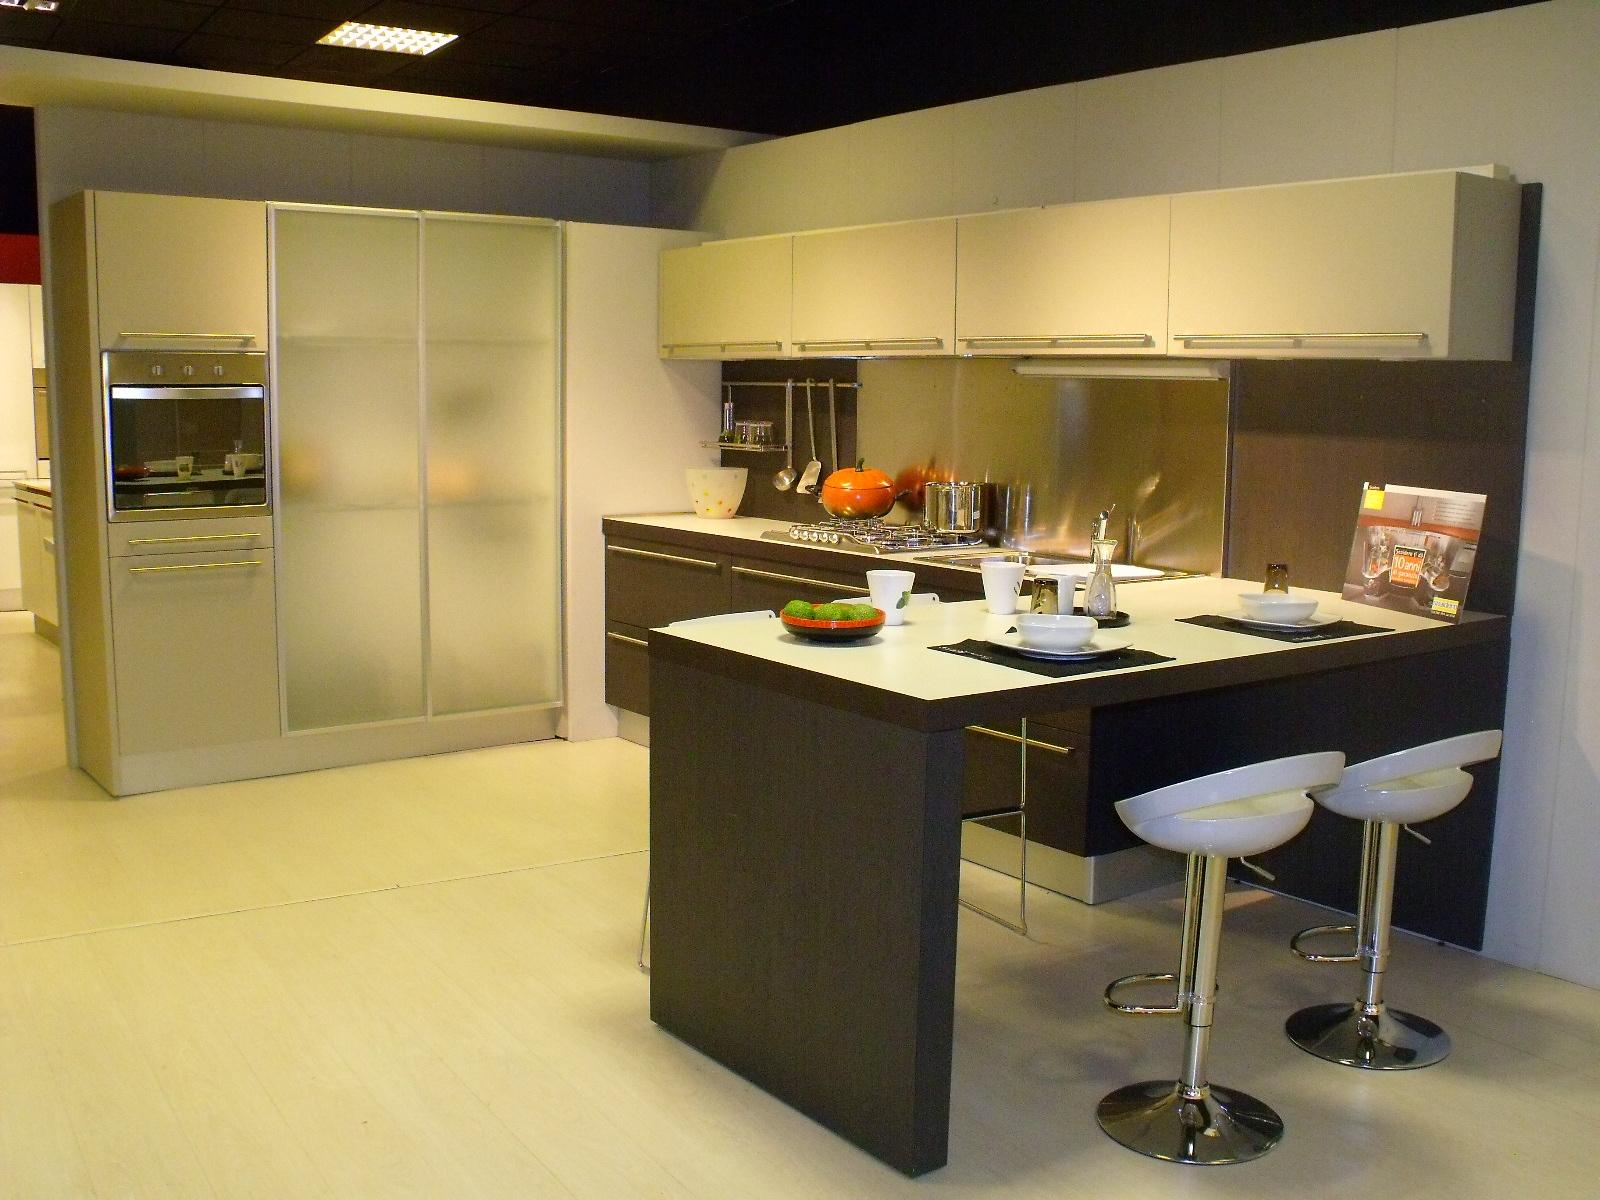 Cucina snaidero sistema zeta moderna legno cucine a - Cucina moderna immagini ...